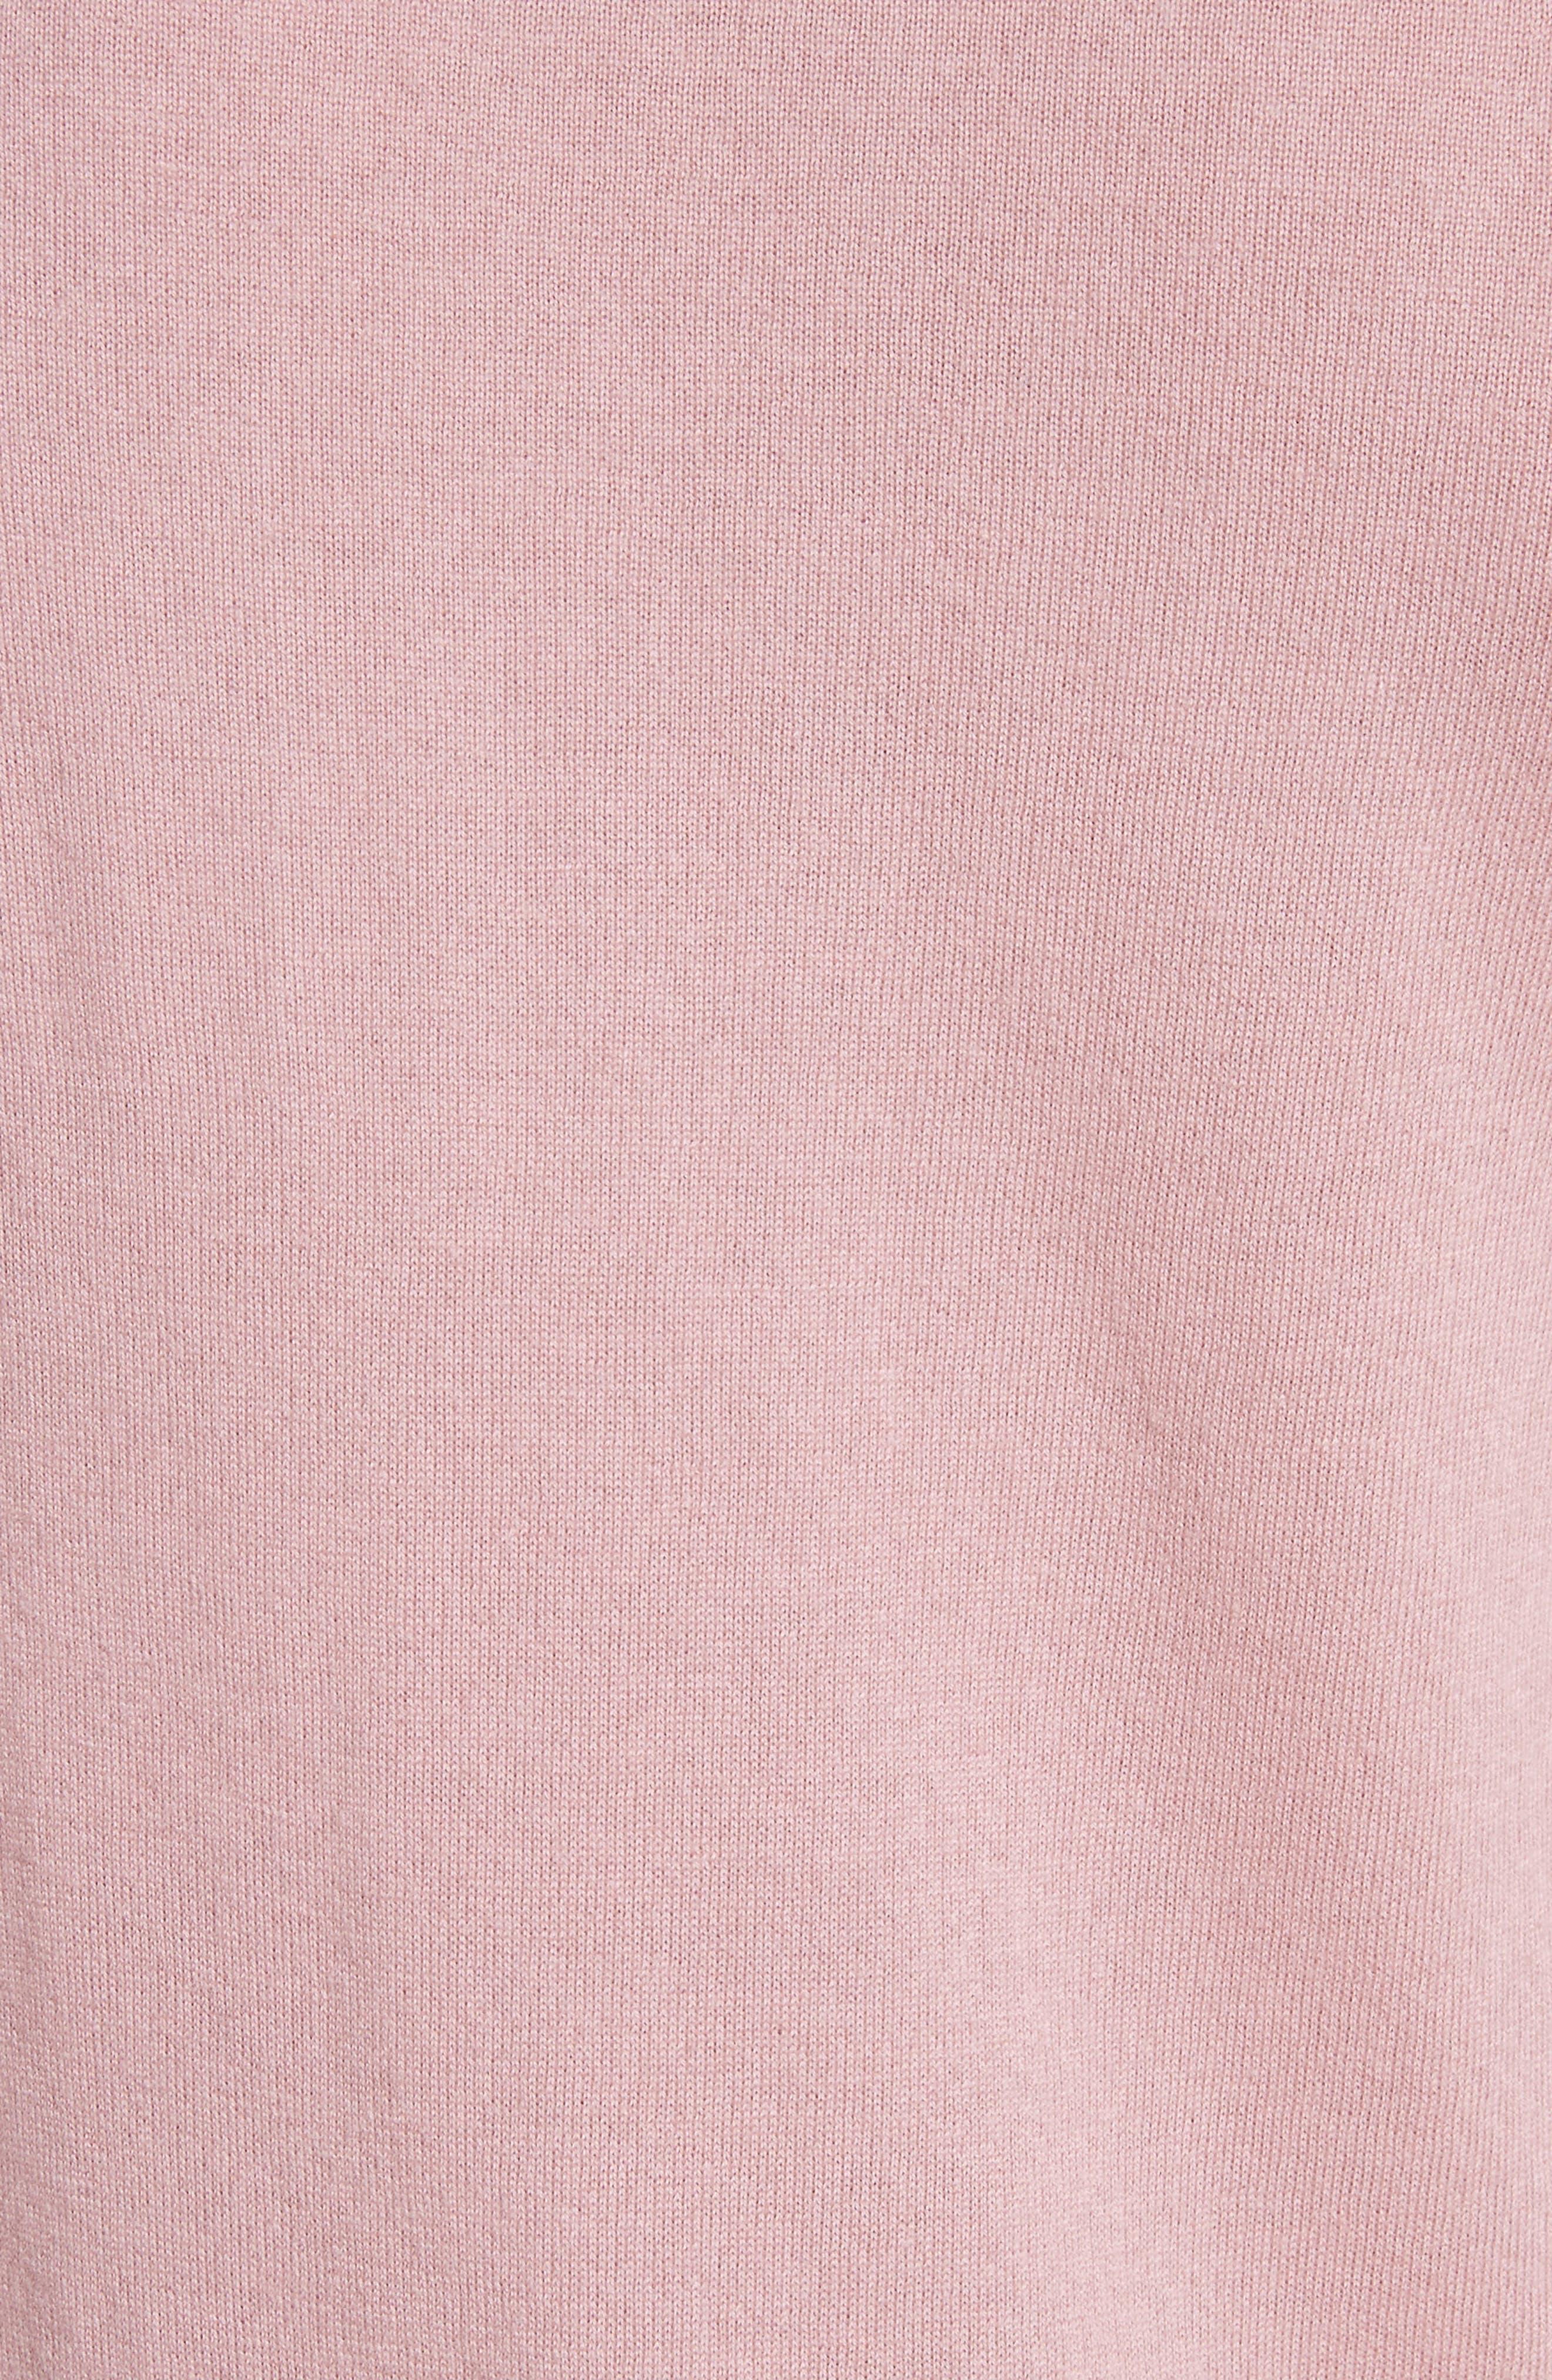 Cashmere Long Sleeve T-Shirt,                             Alternate thumbnail 5, color,